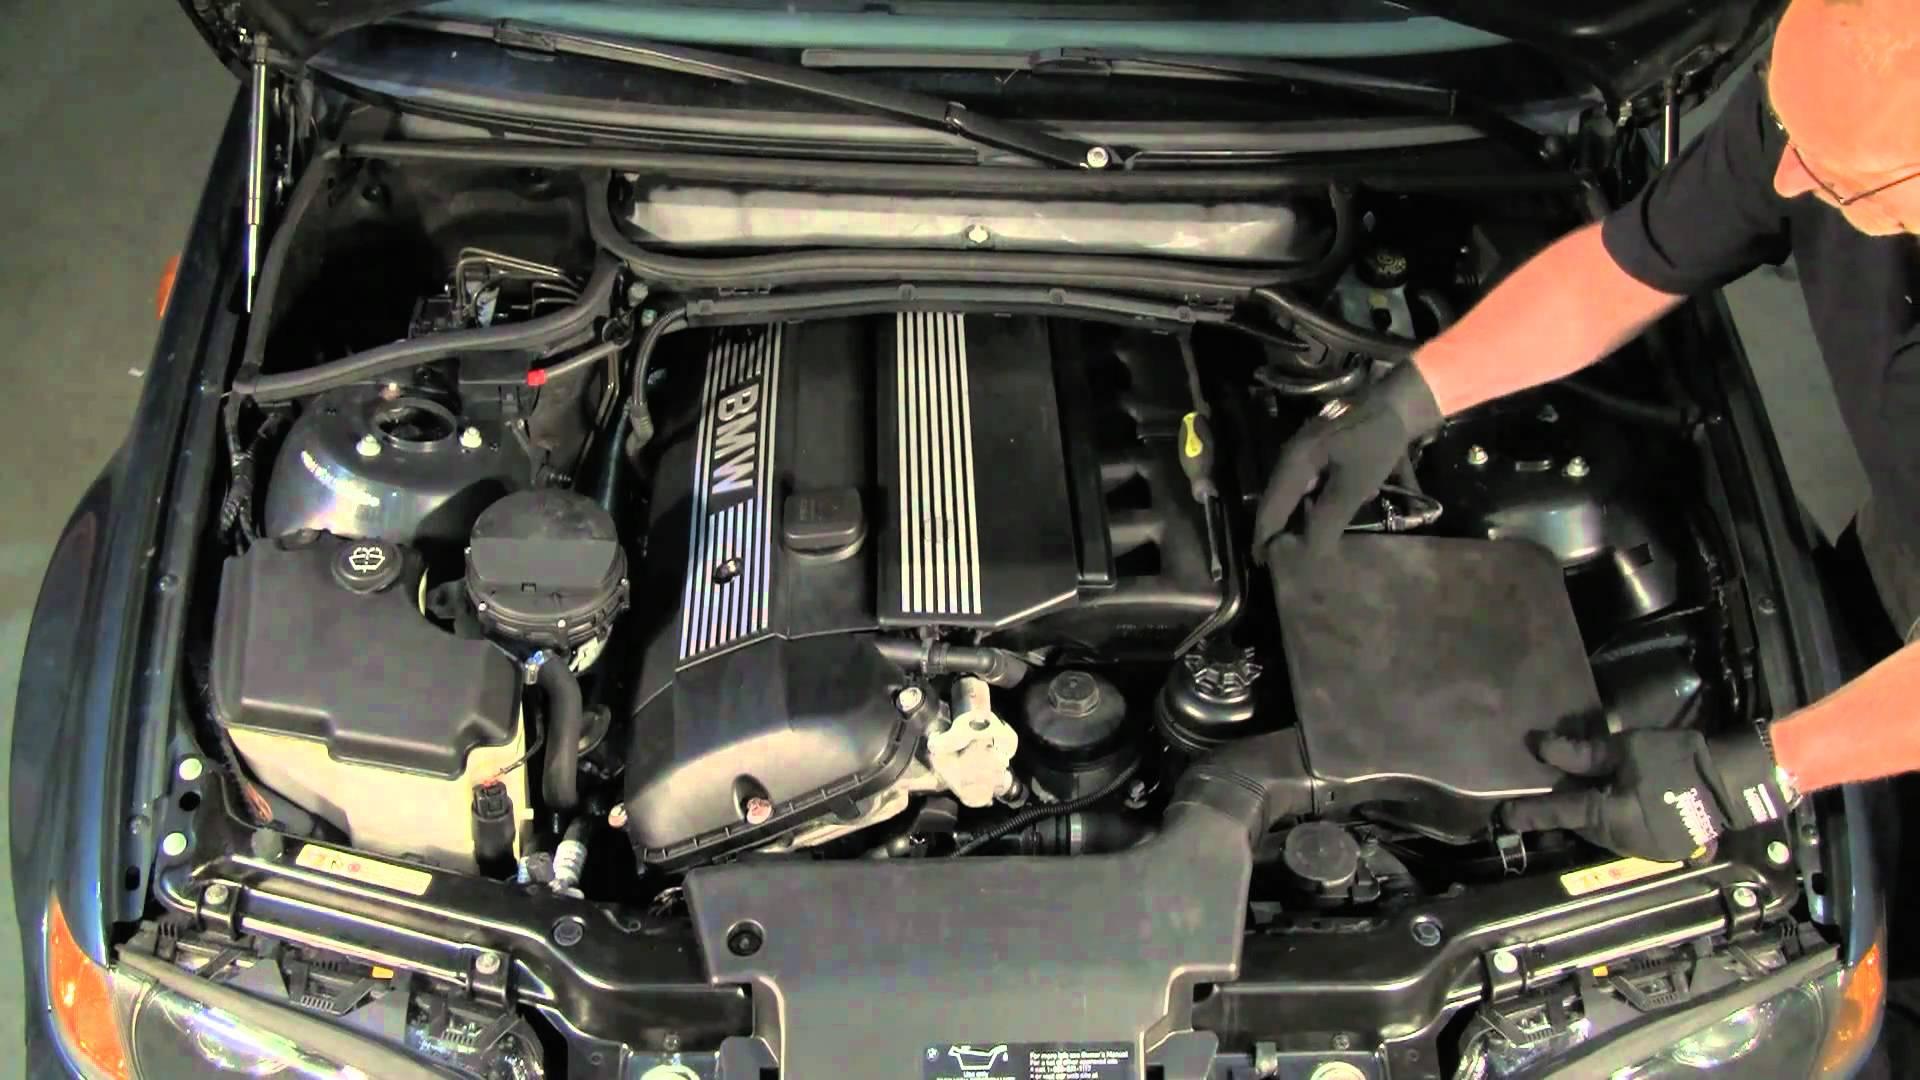 Bmw 2003 Engine Diagram Best Wiring Diagrams Add Preference Add Preference Ekoegur Es